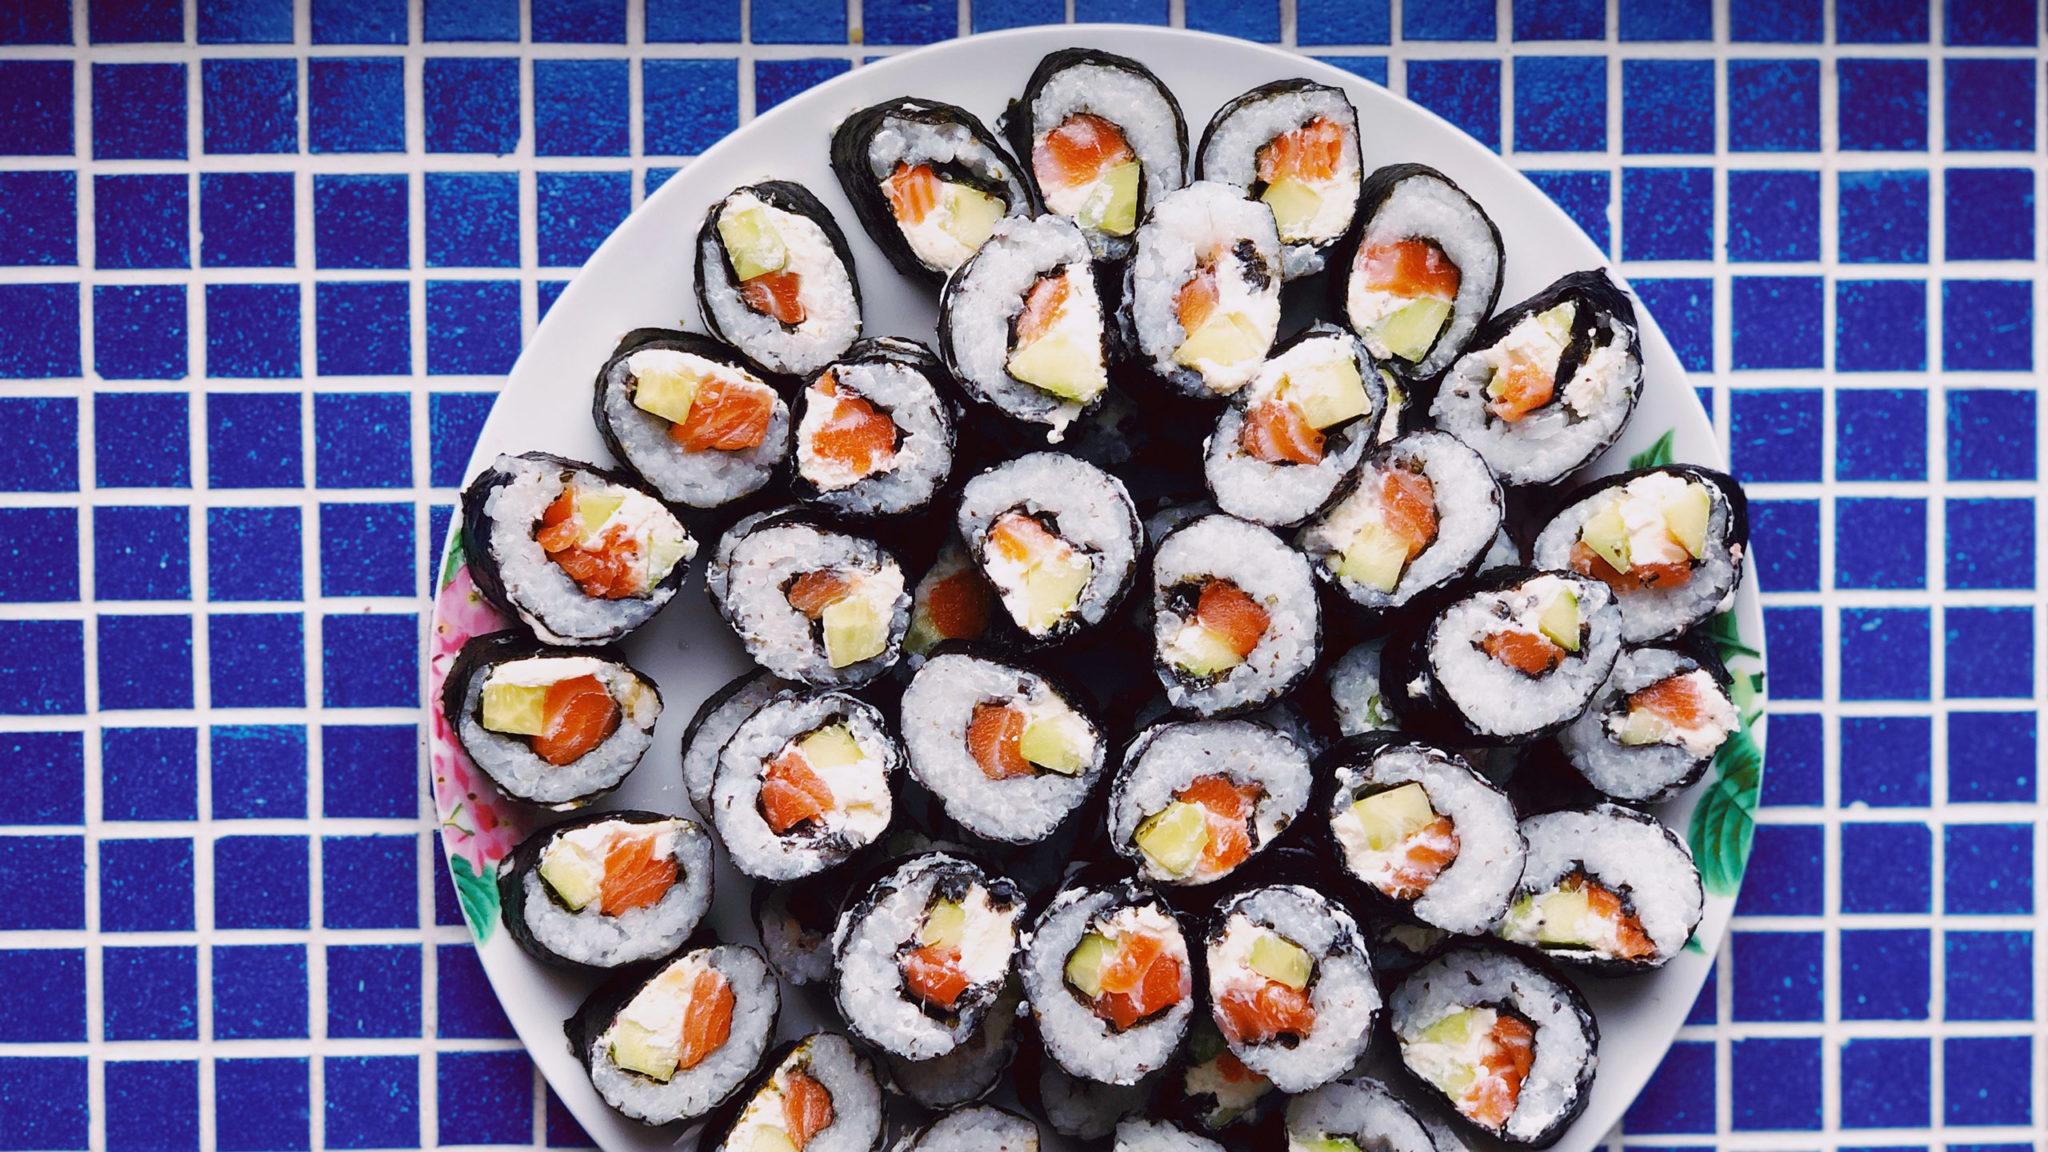 alga nori, nori, cambio climático, sushi